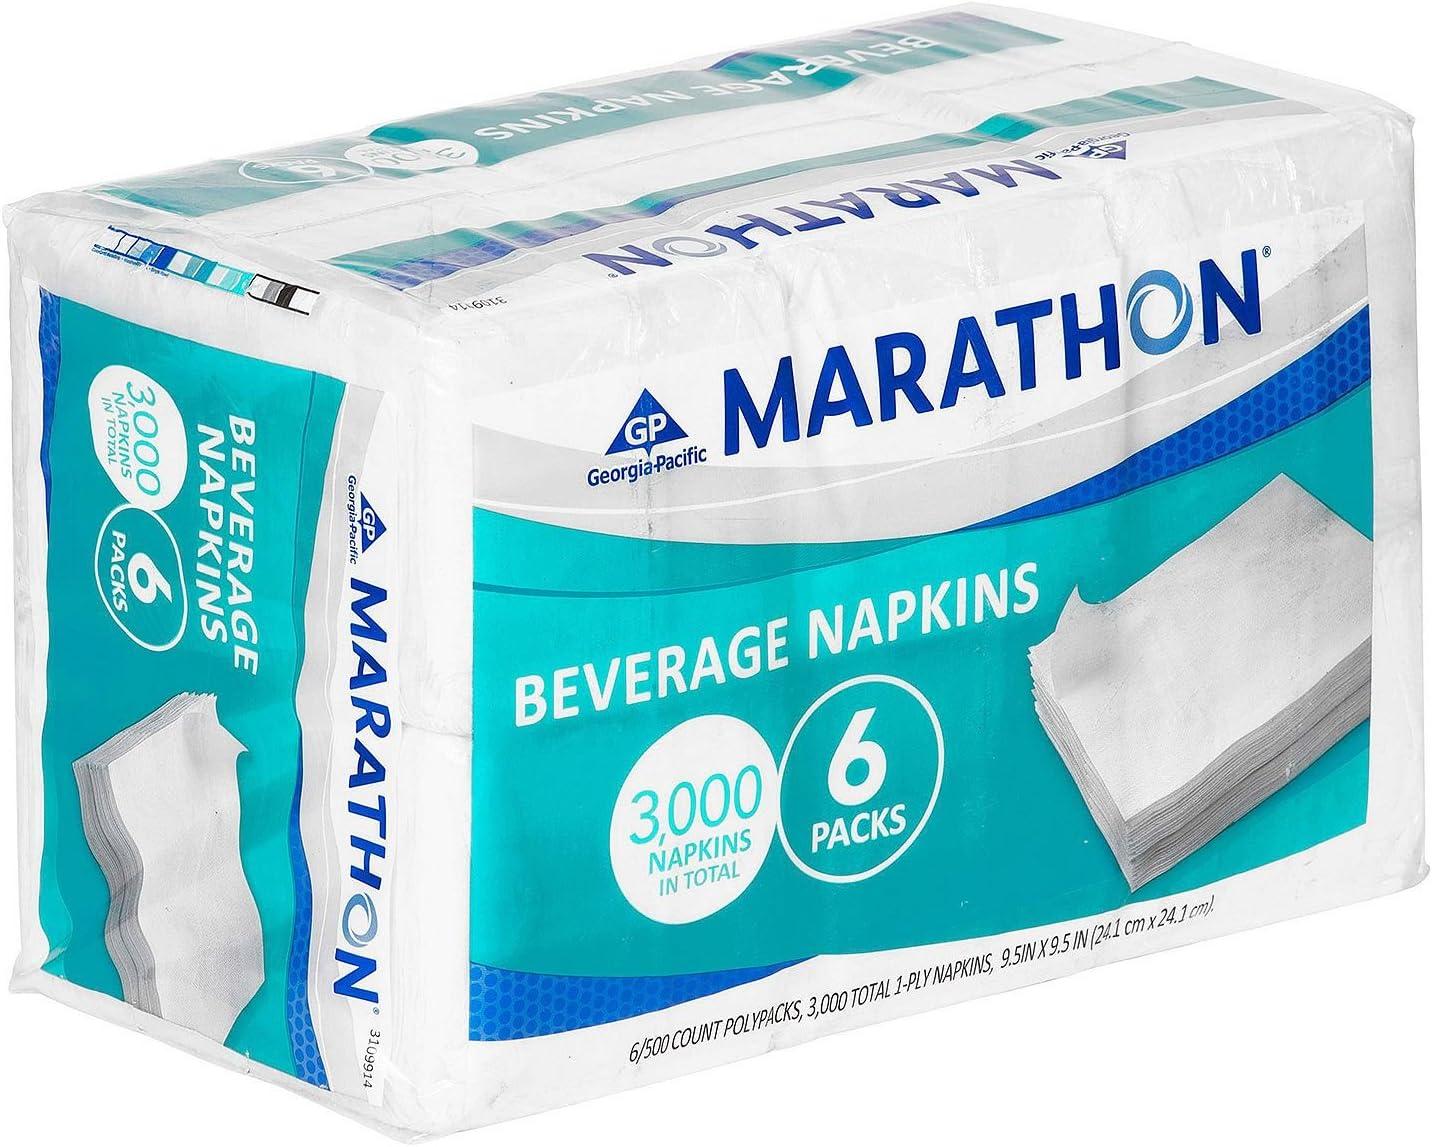 Marathon - Beverage Napkin, 1/4 Fold - 3,000 Napkins